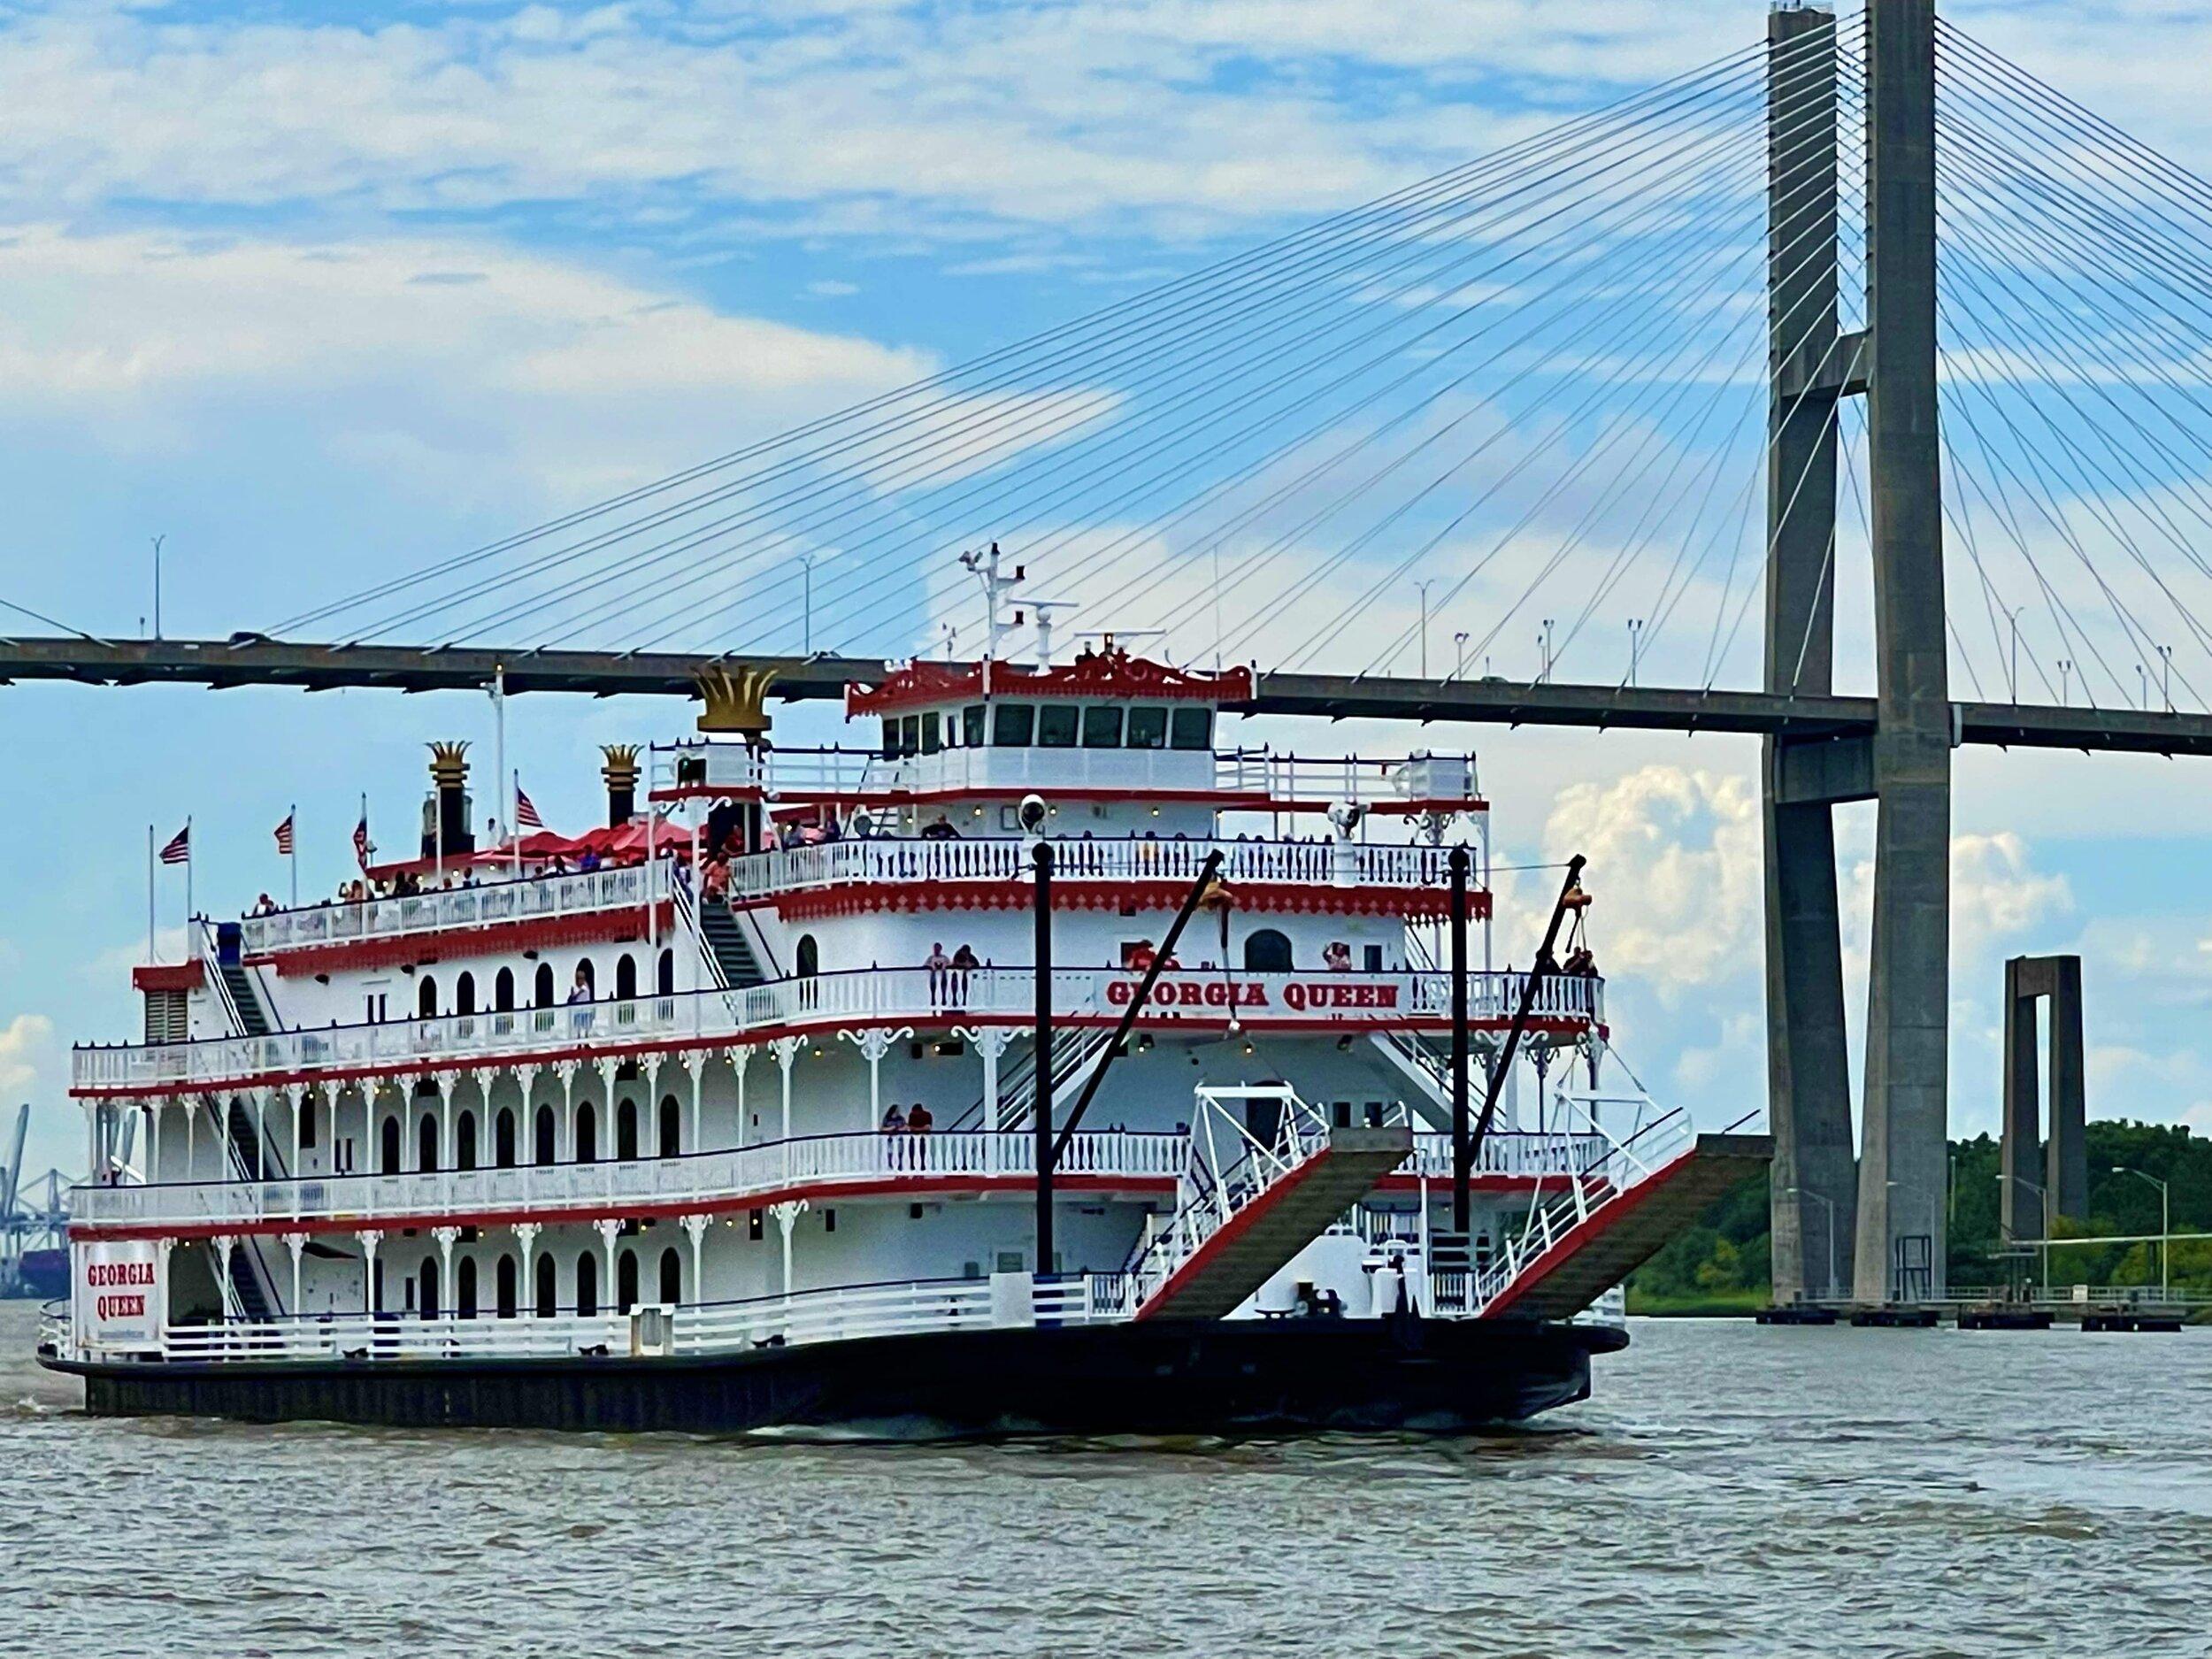 Savannah-plant-riverside-min.jpeg